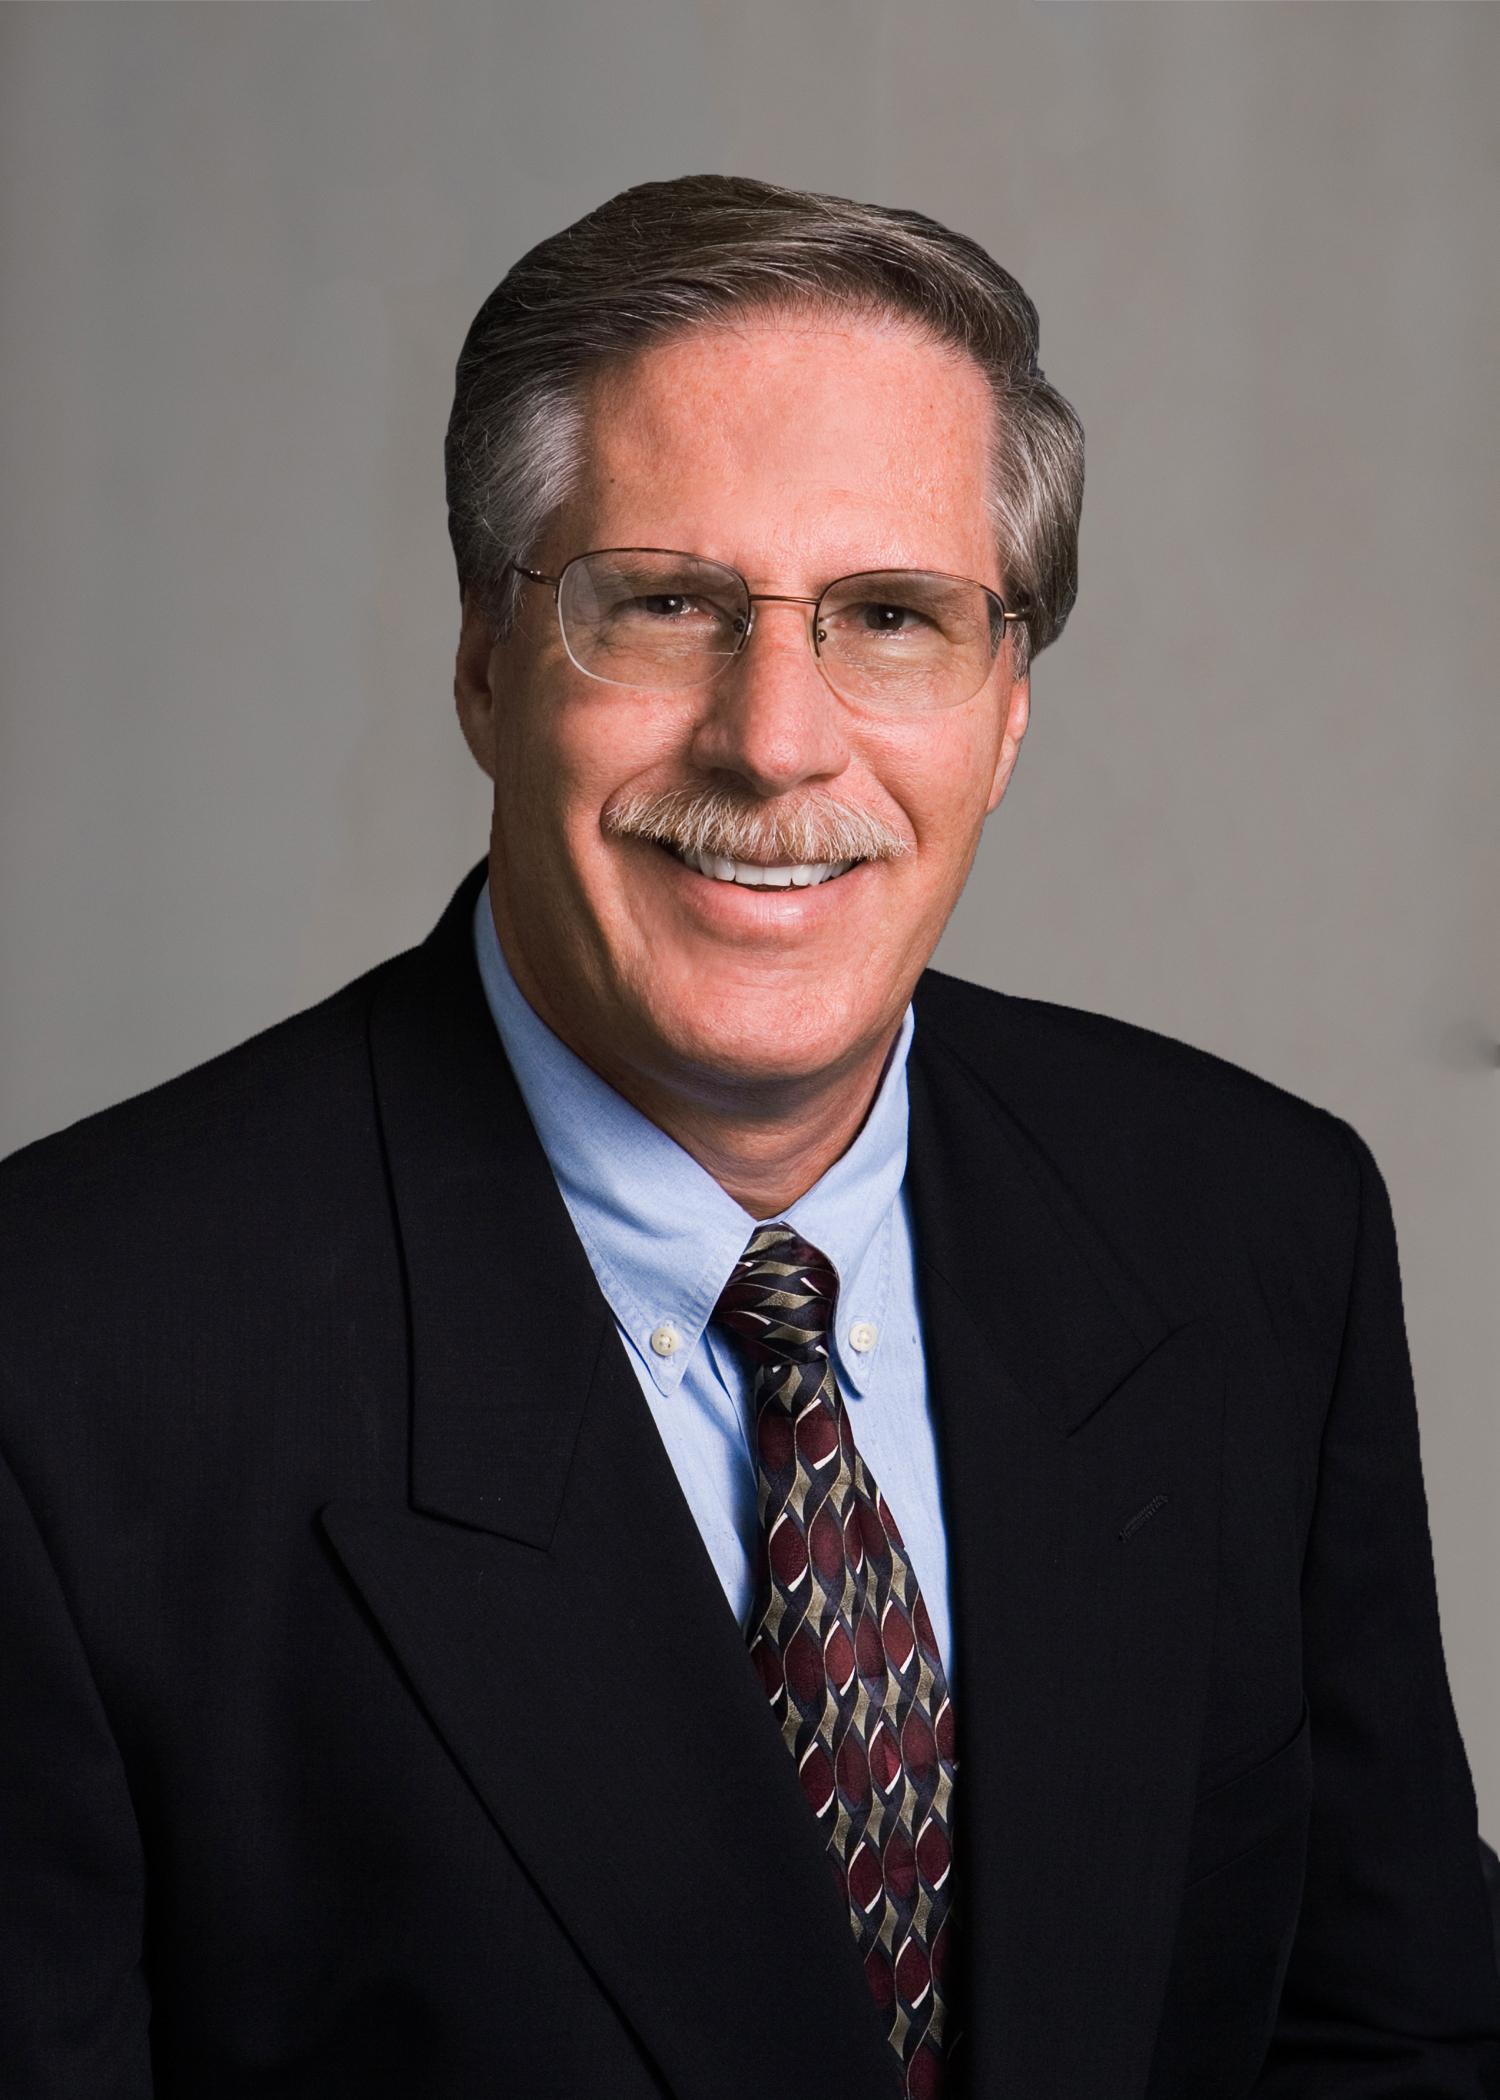 Arthur Schoenewaldt Director of Restoration